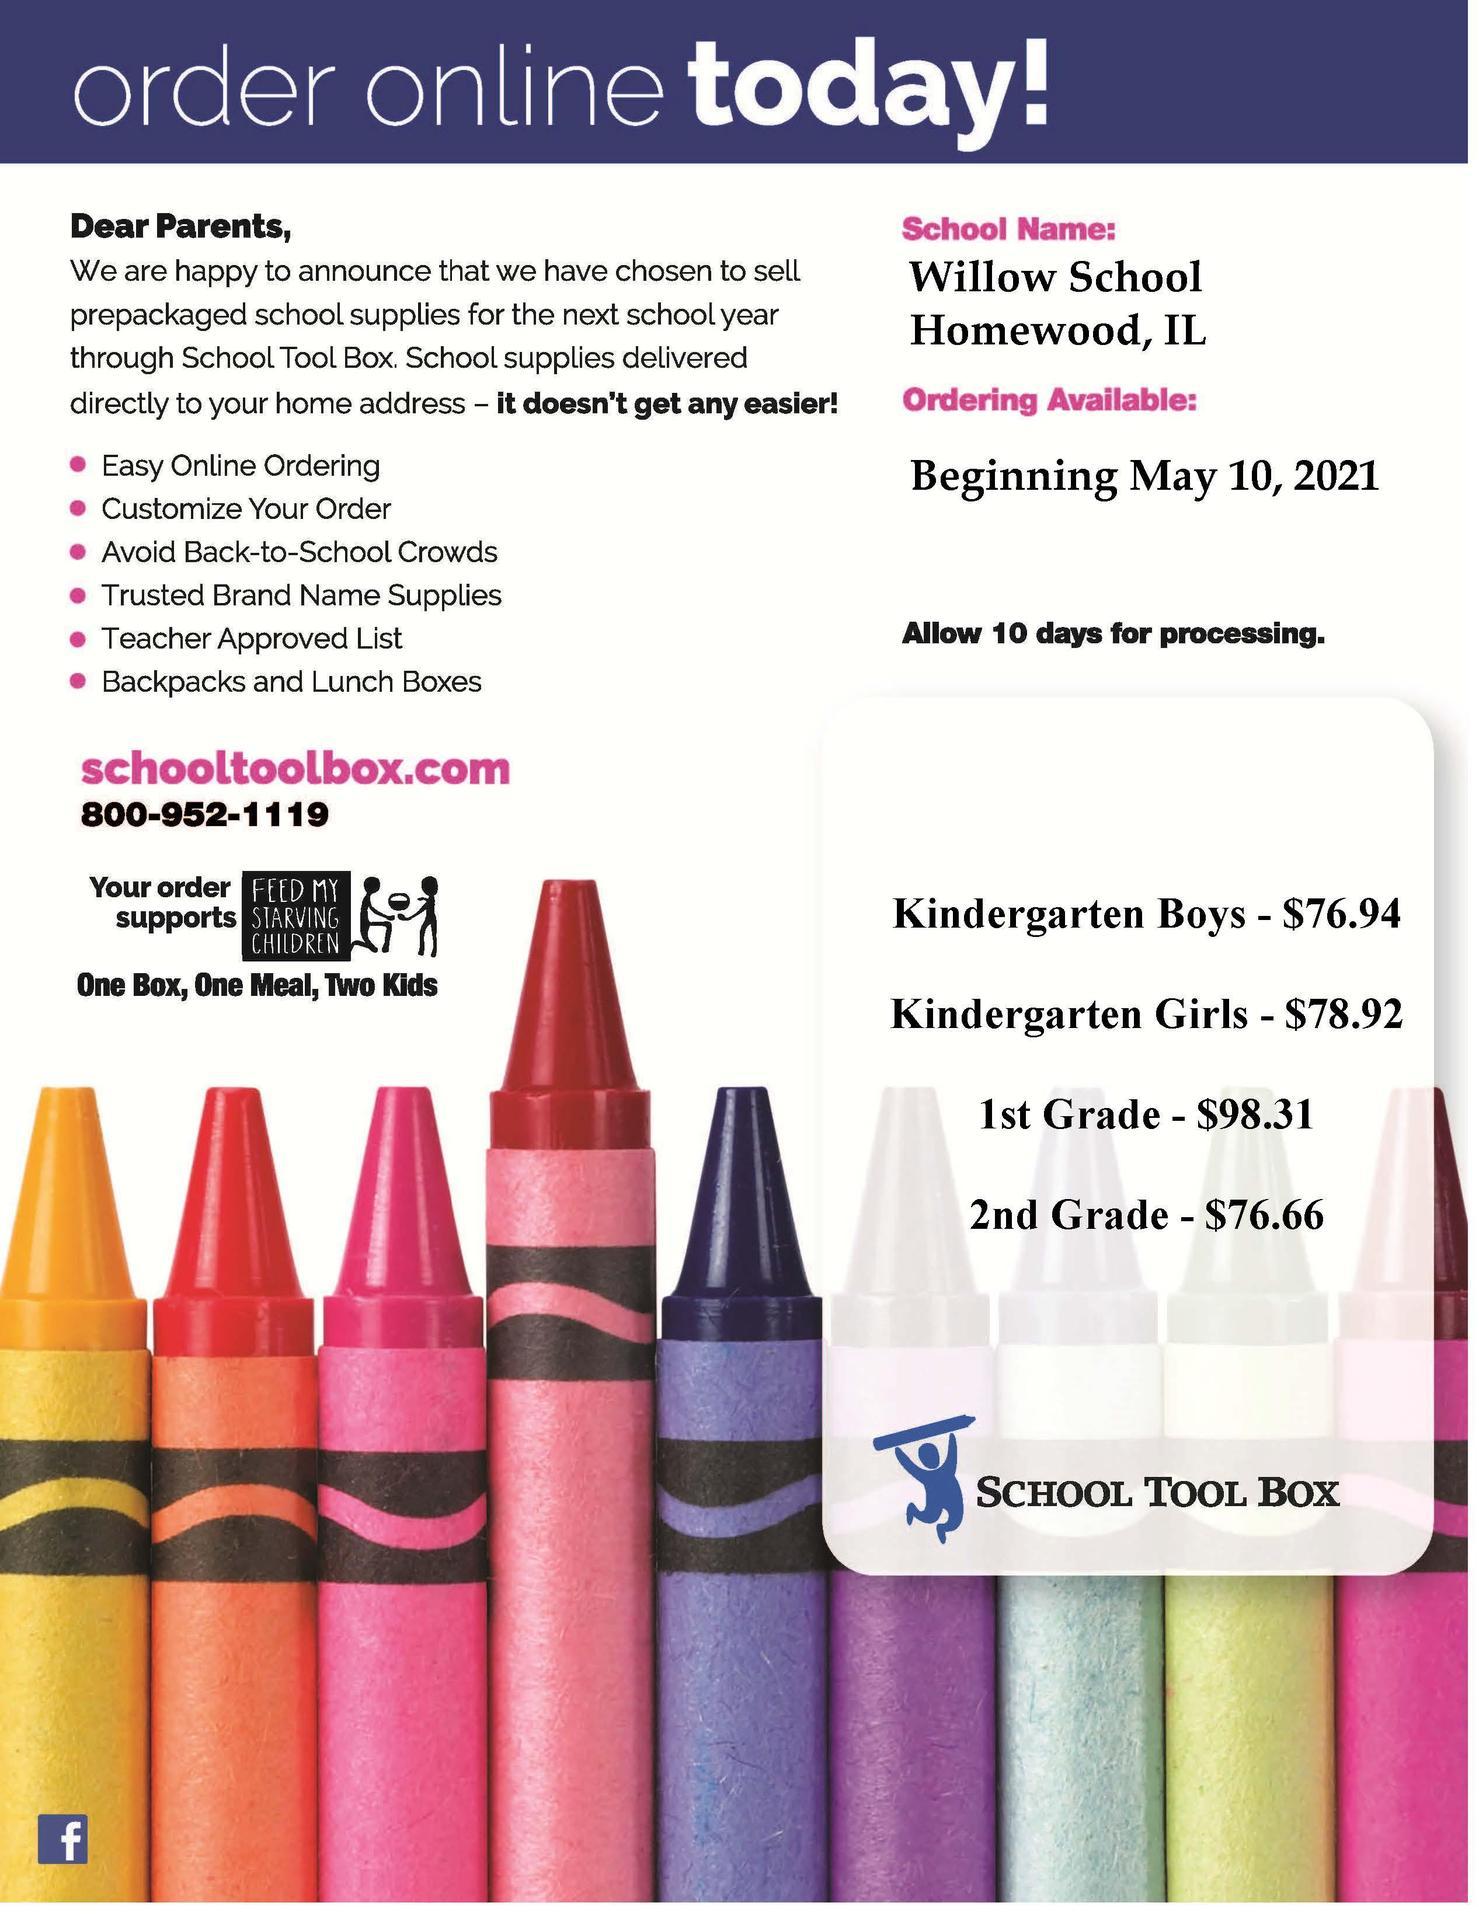 School Tool Box information